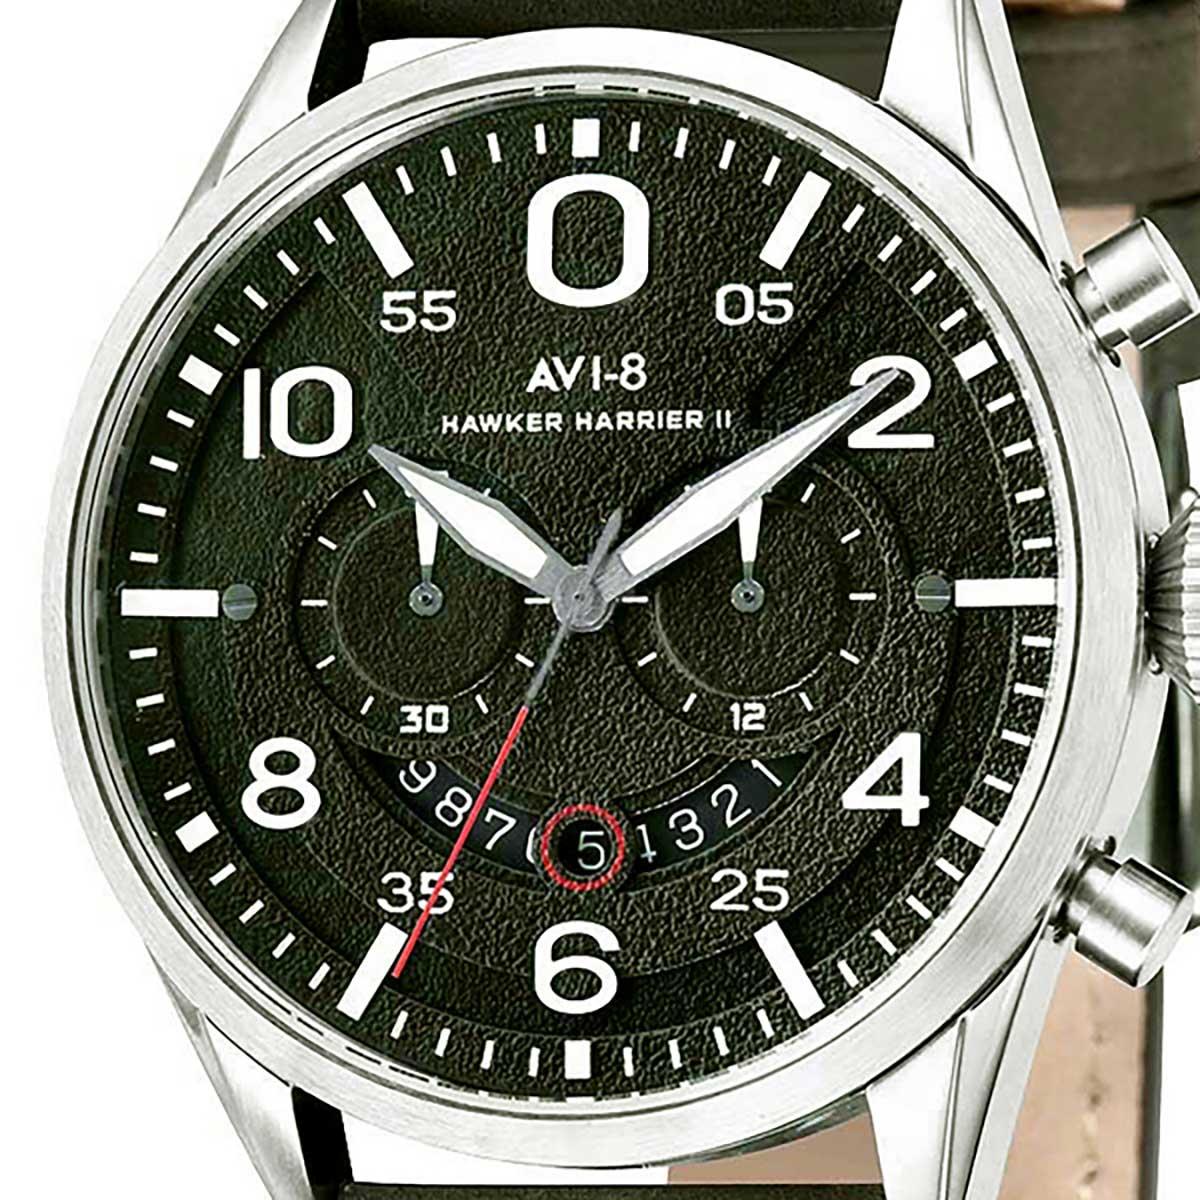 AVI-8 アヴィエイト 電池式クォーツ 腕時計 [AV-4031-03] 並行輸入品  デイト クロノグラフ